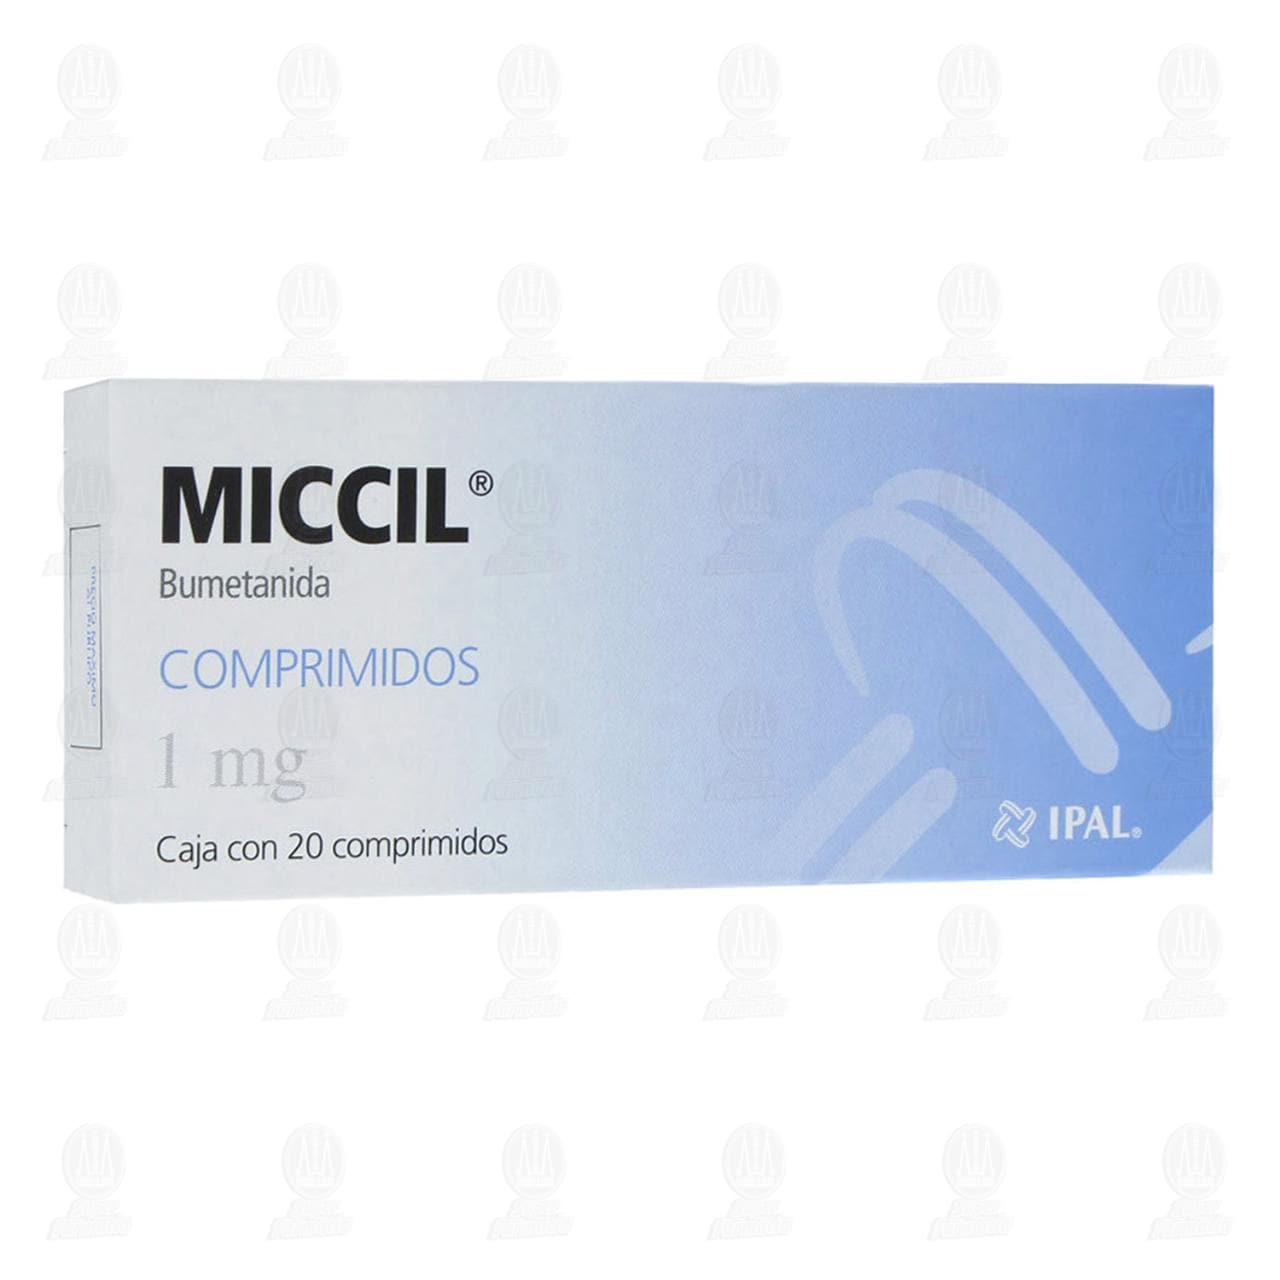 Comprar Miccil 1mg 20 Comprimidos en Farmacias Guadalajara